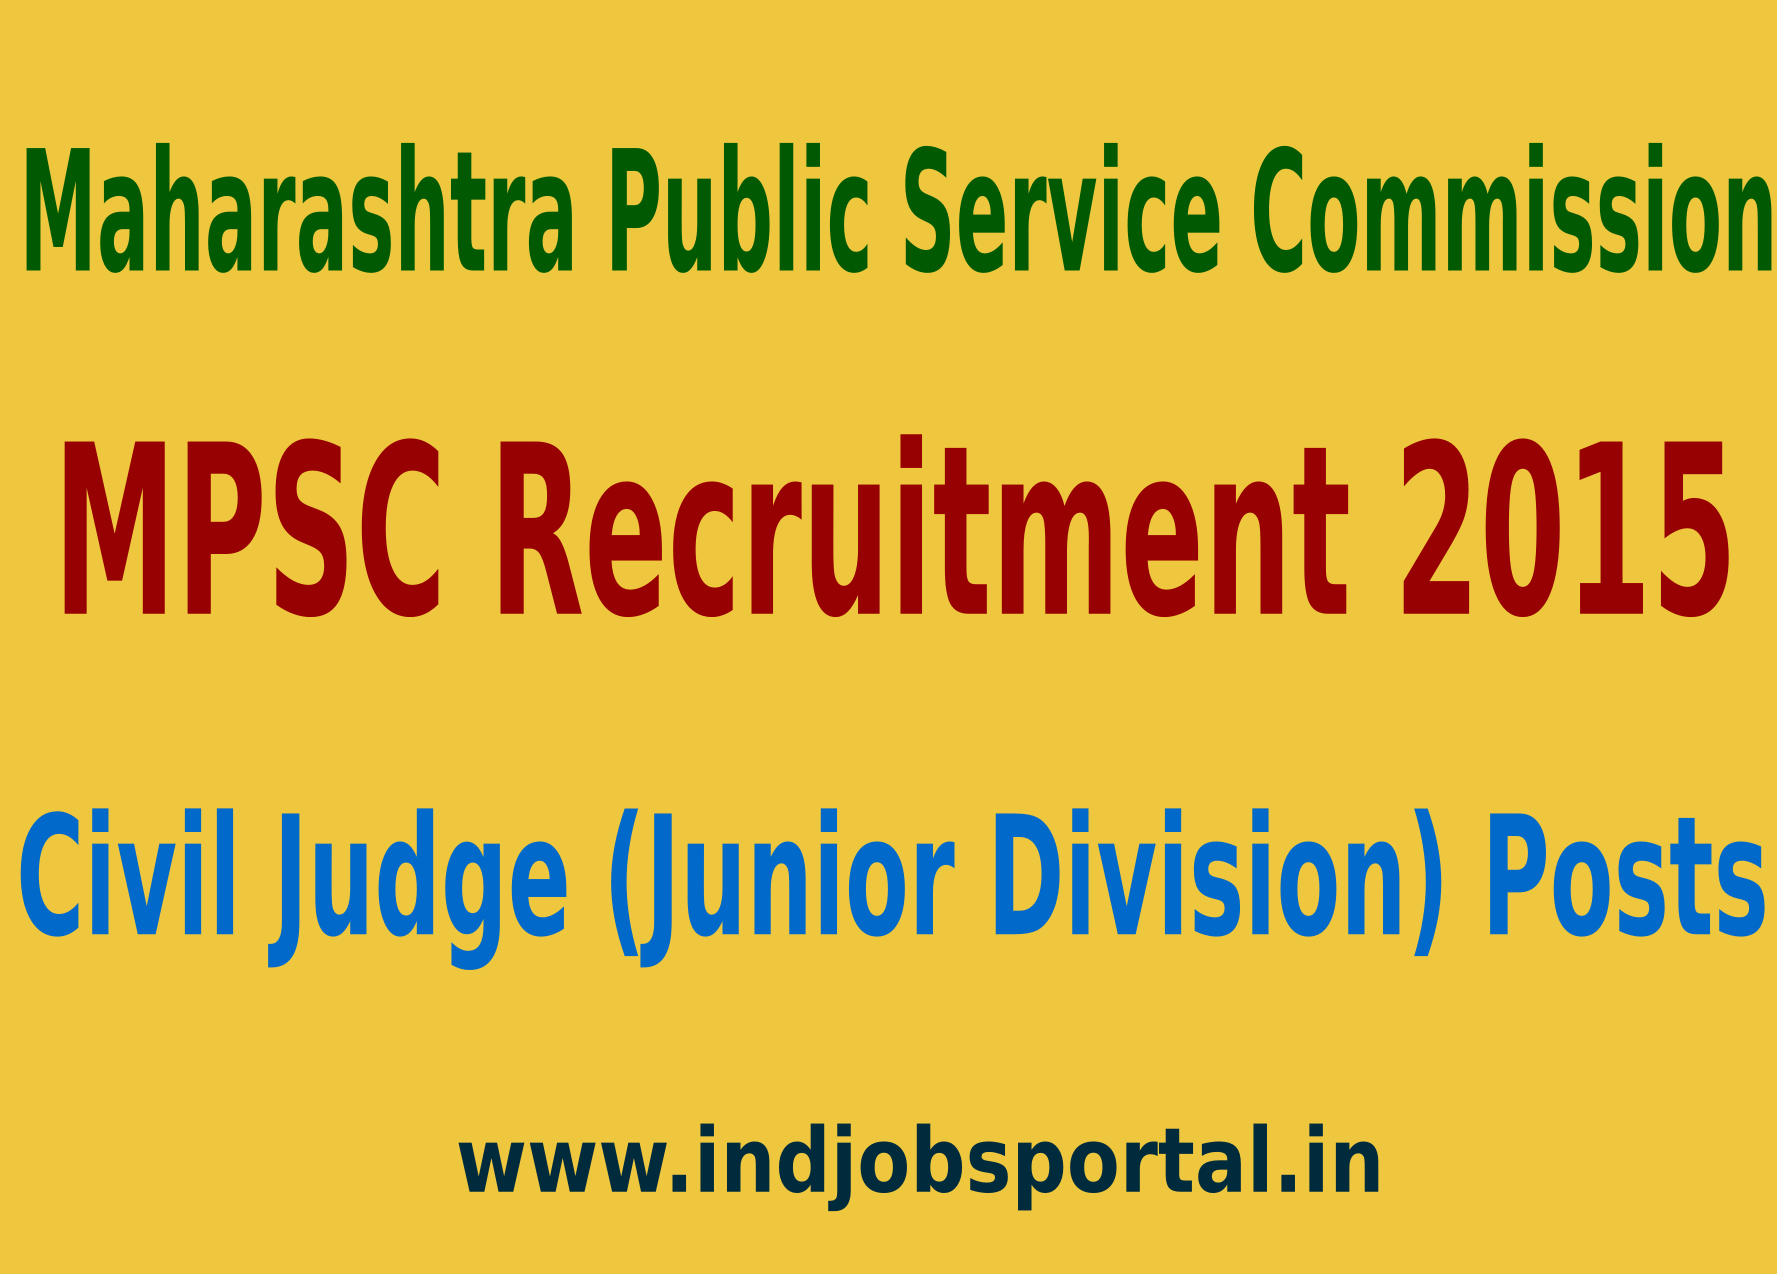 MPSC Recruitment 2015 Apply Online For 227 Civil Judge (Junior Division) Posts